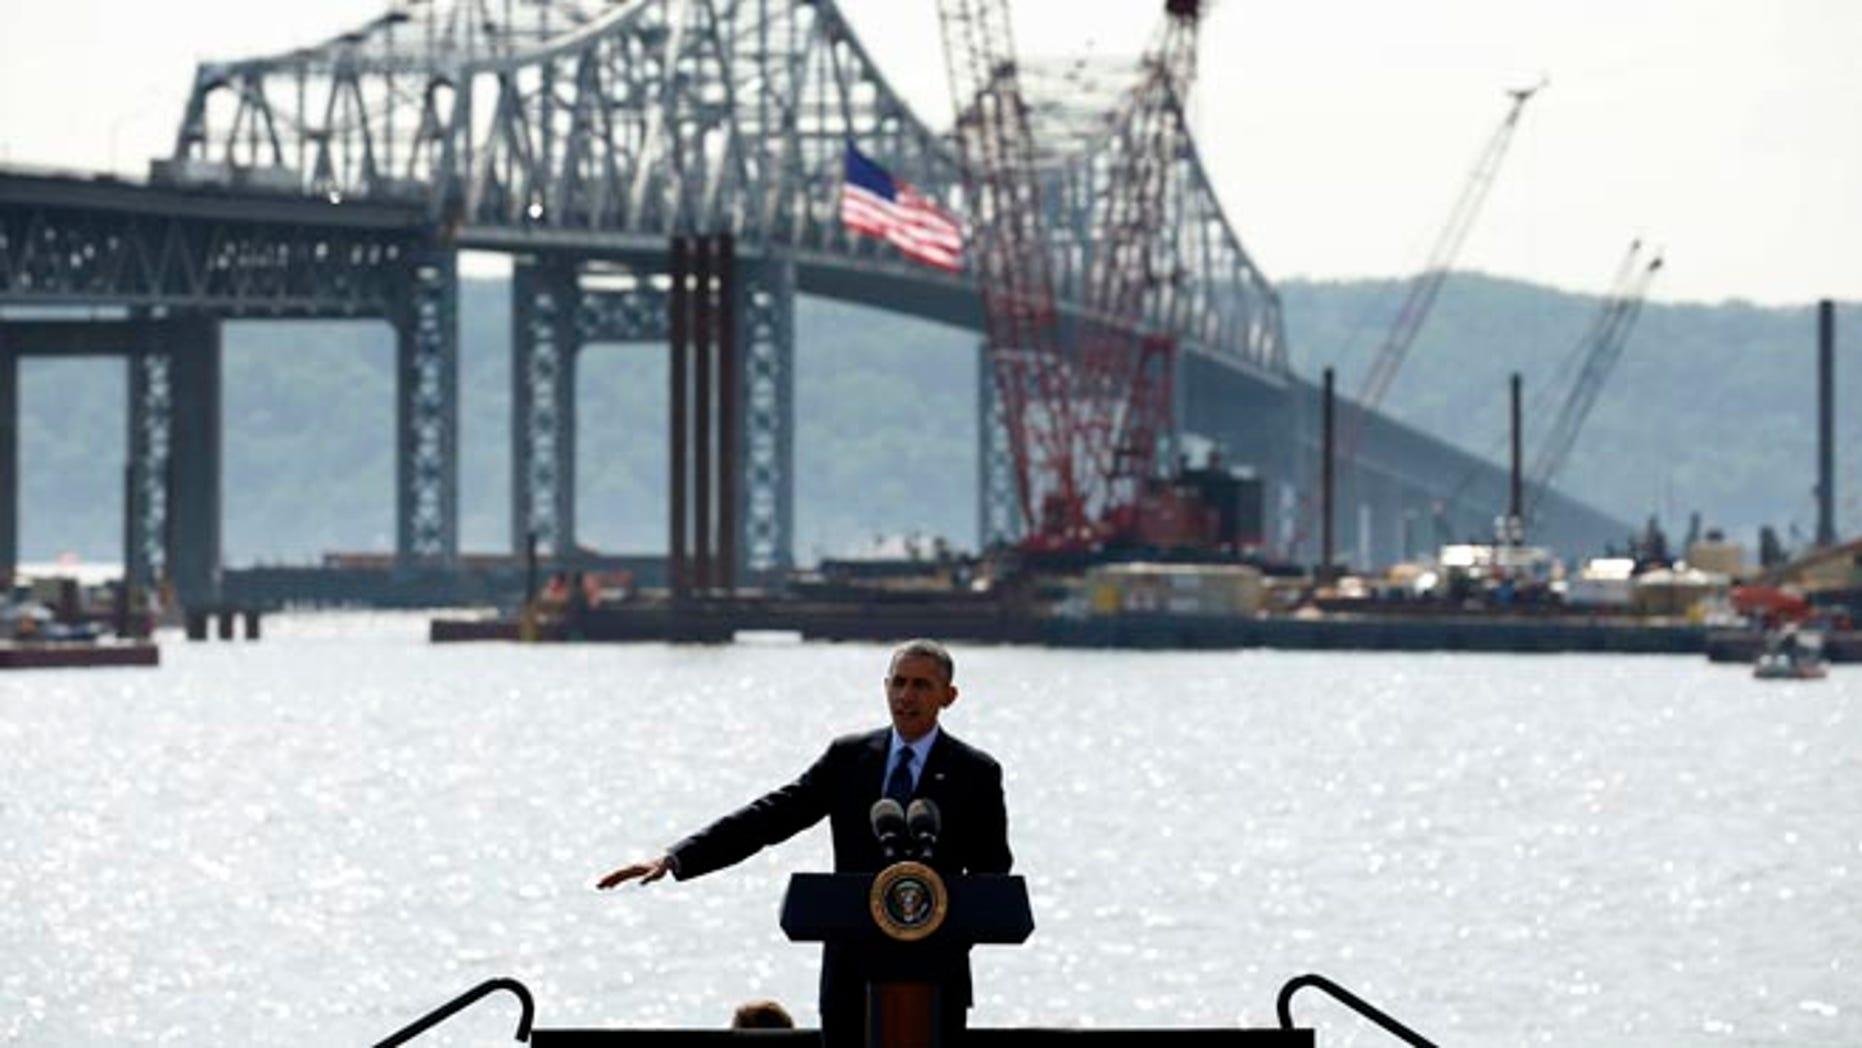 FILE: May 14, 2014: President Obama speaks on transportation infrastructure, near the Tappan Zee Bridge, Tarrytown, New York.